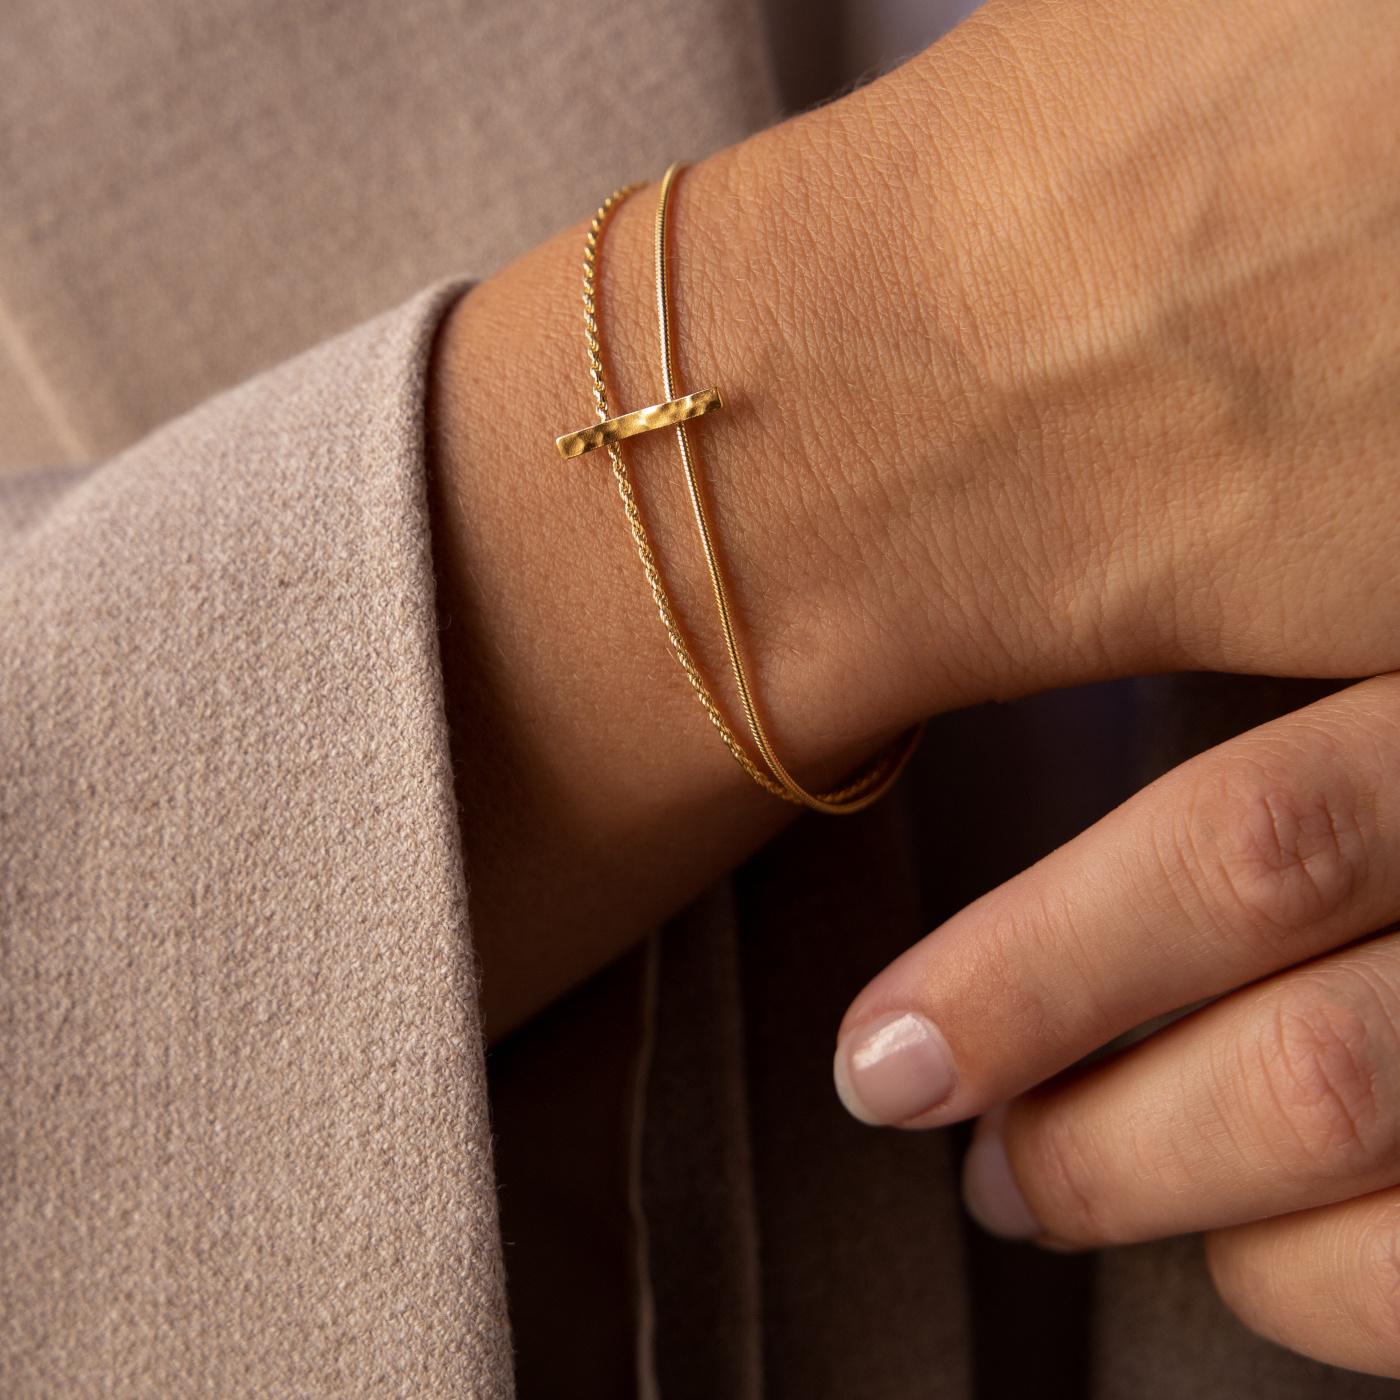 Violet Hamden Sisterhood Moonscape 925 sterling zilver goudkleurige dubbele armband met balkje